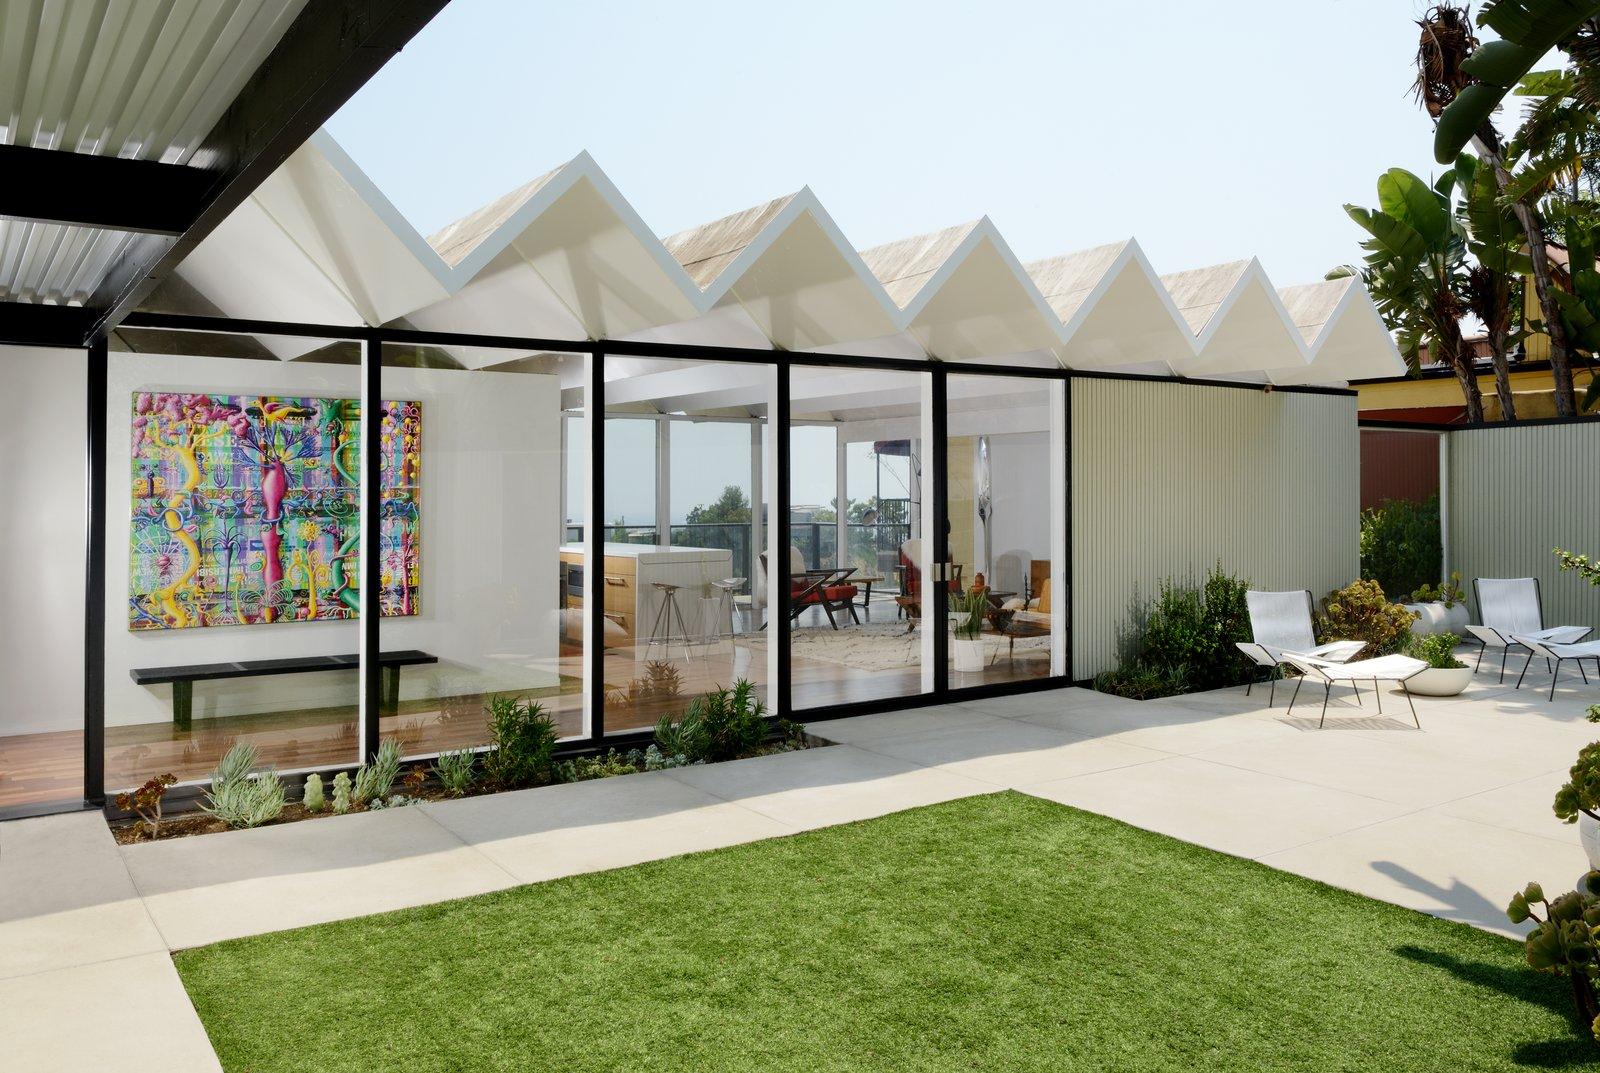 A Richard Banta Designed Midcentury In Los Angeles Asks $3.2M